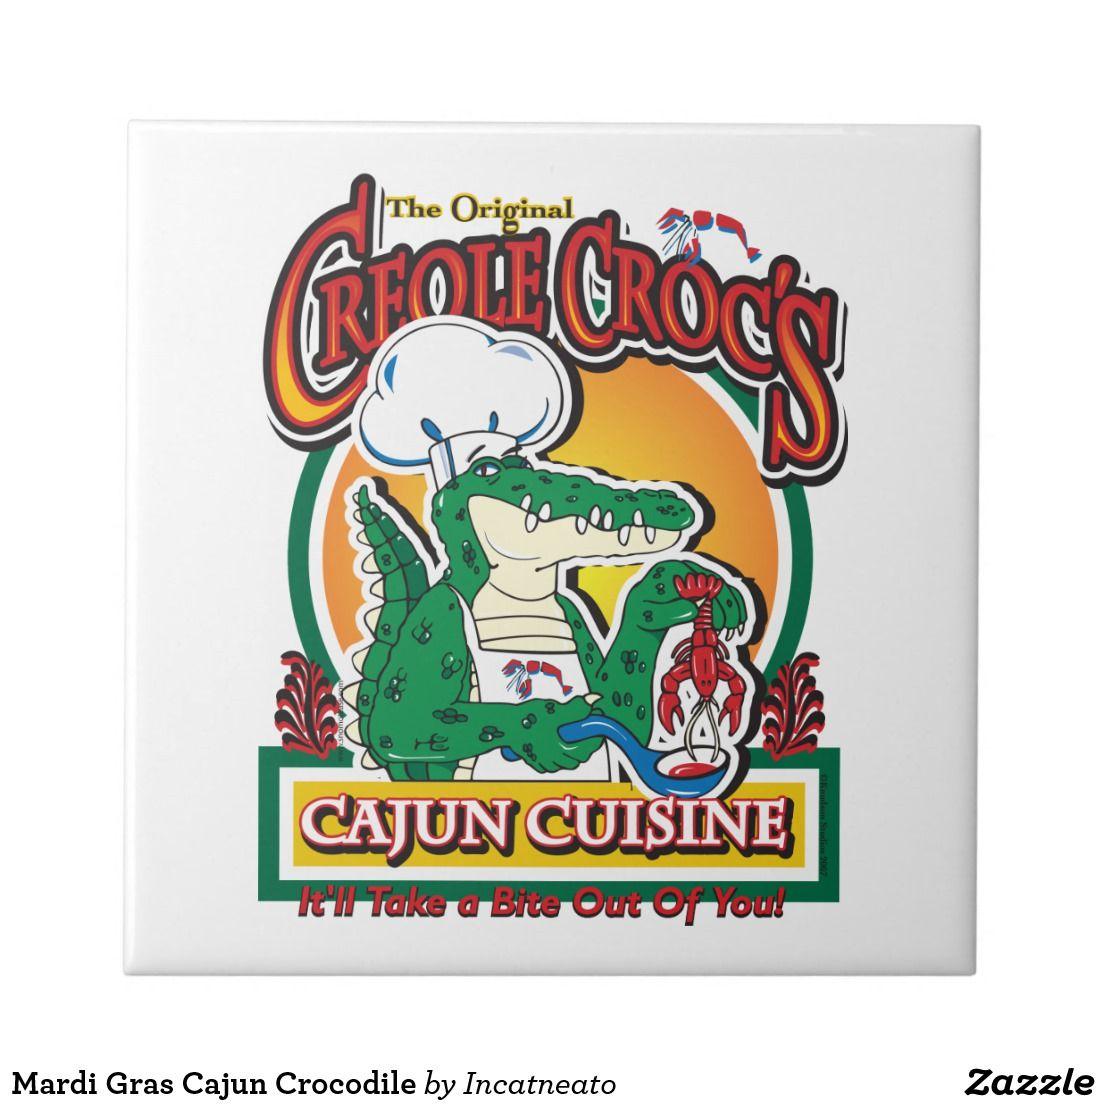 Mardi Gras Cajun Crocodile Ceramic Tile New Orleans And Mardi Gras